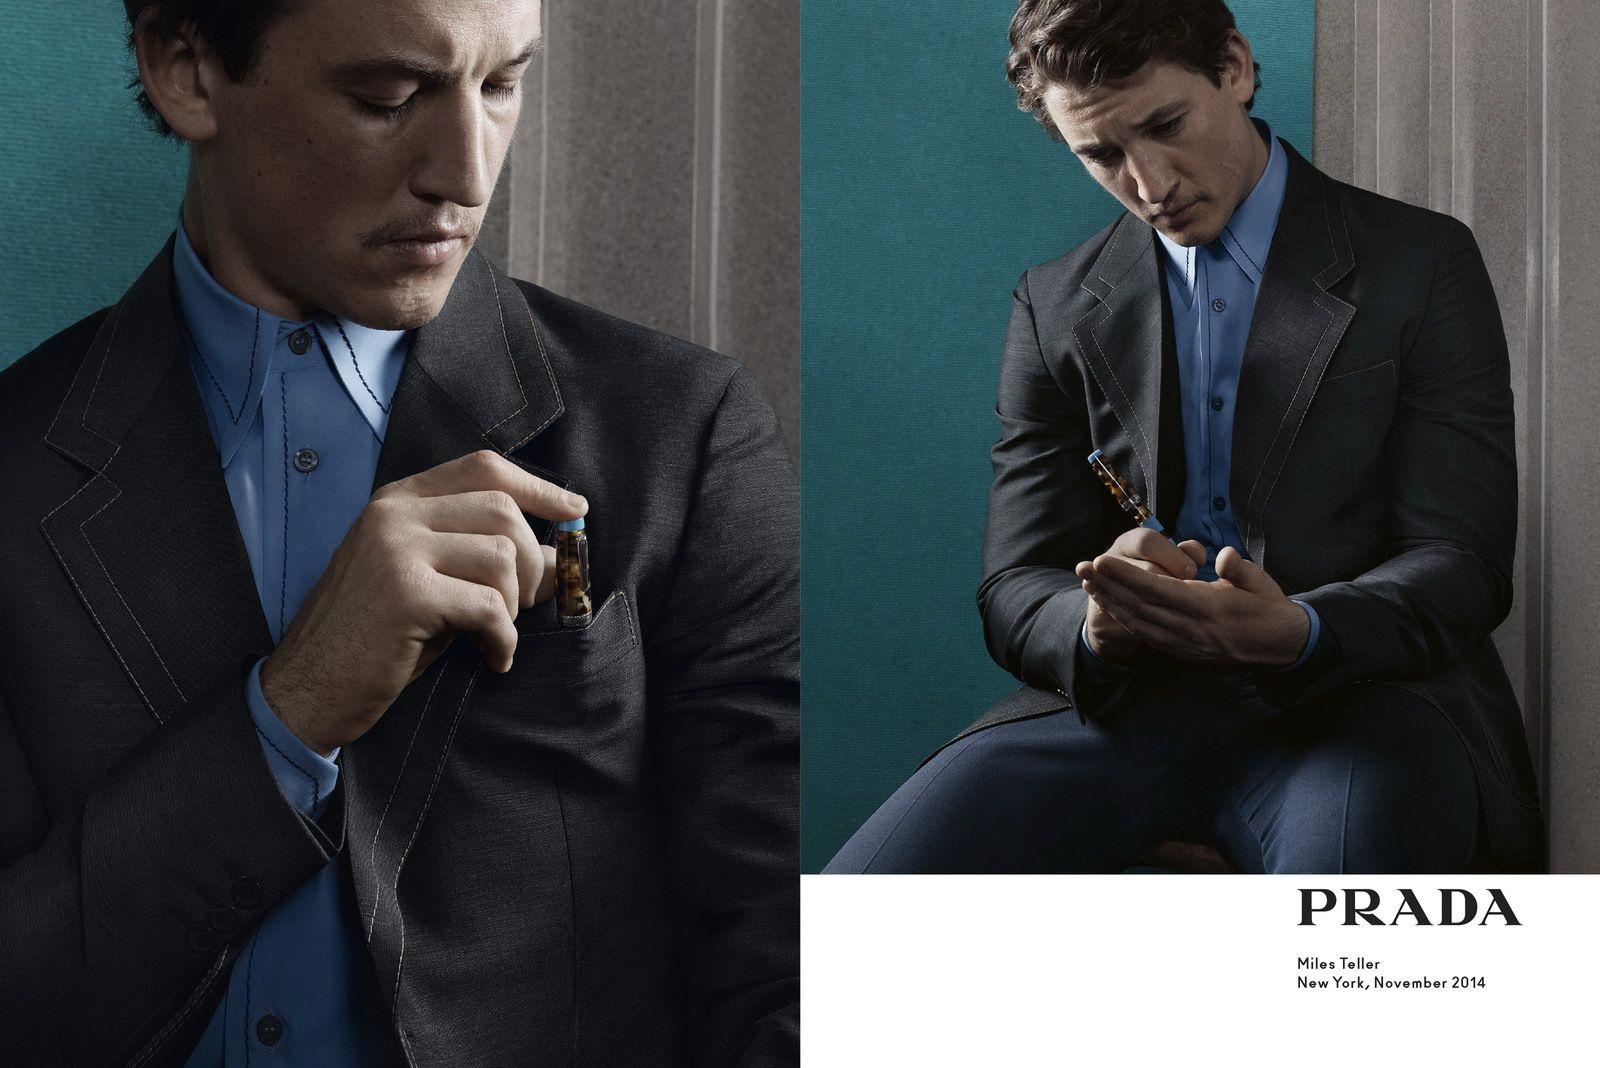 Prada men's spring 2015 Ad